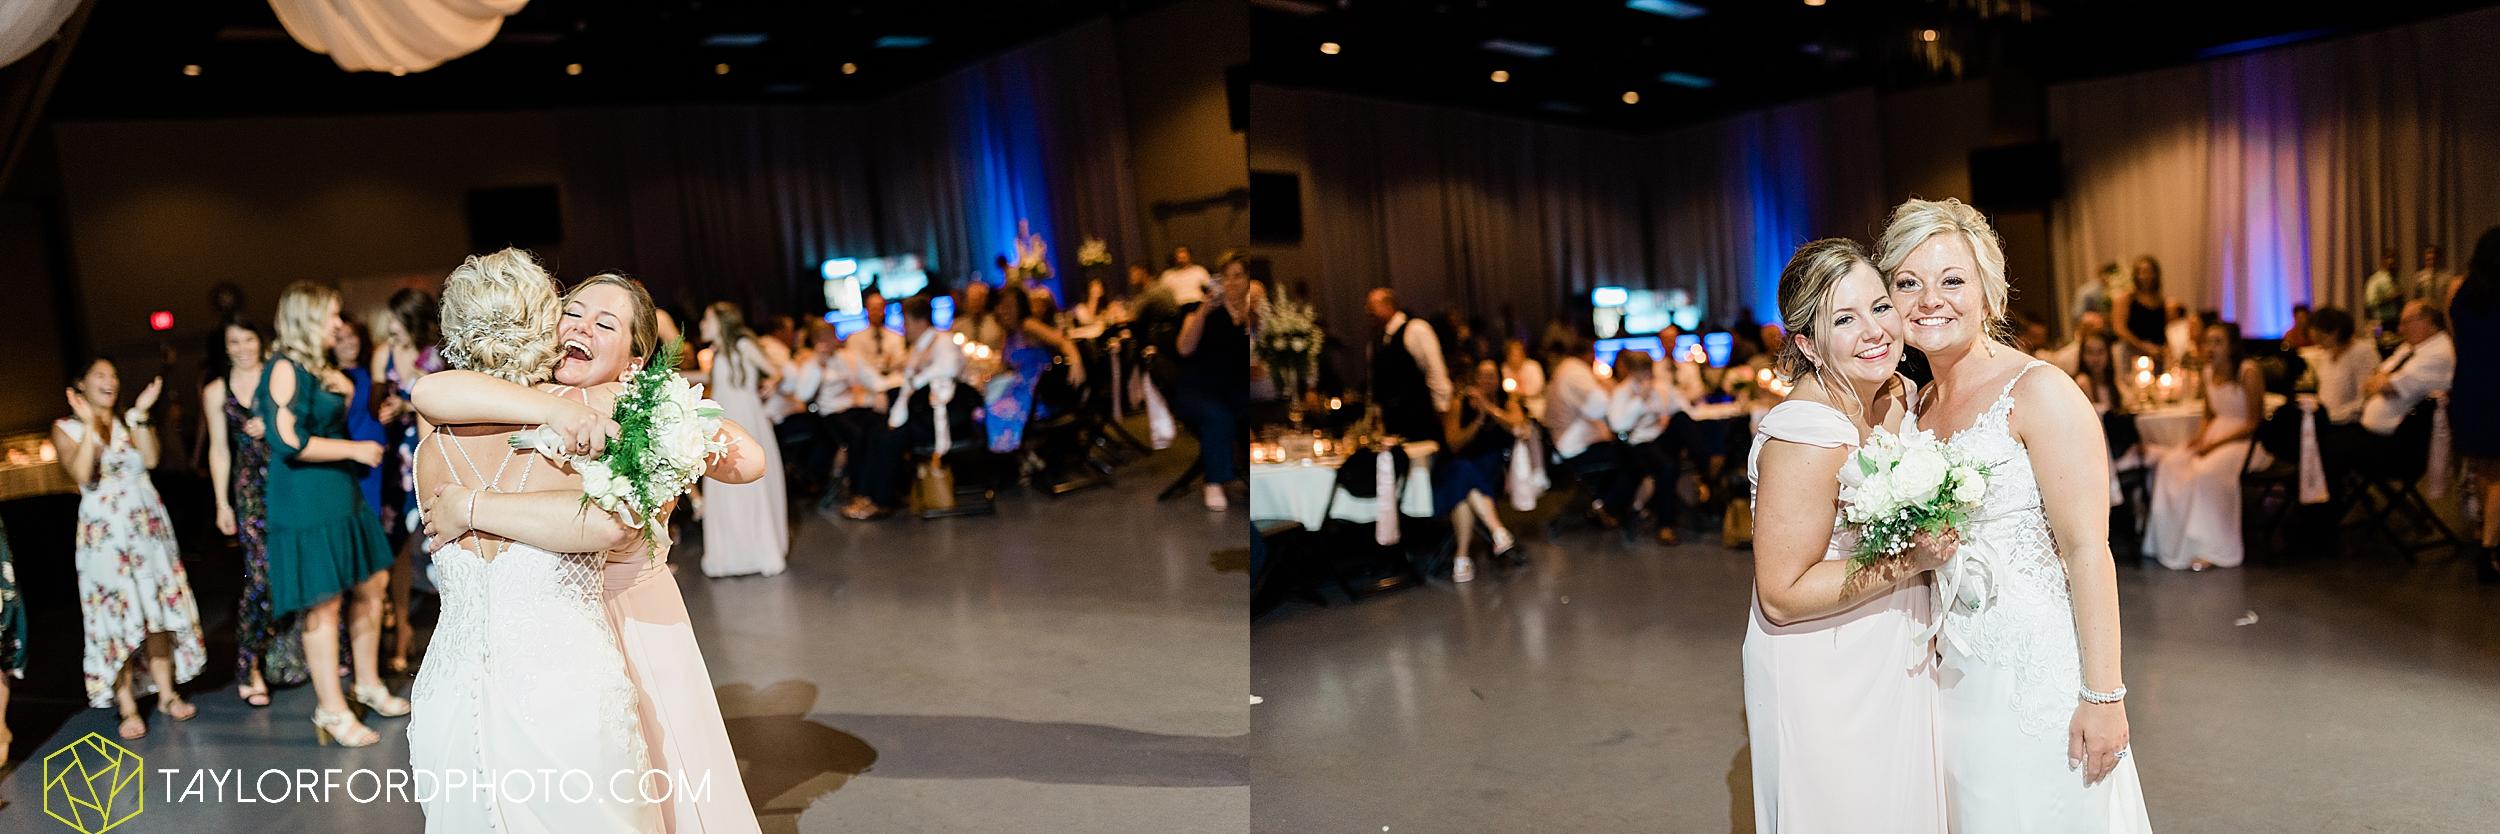 carly-trent-lima-elida-ohio-wedding-the-met-civic-center-reception-immanuel-united-methodist-church-photography-taylor-ford-hirschy-photographer_3399.jpg